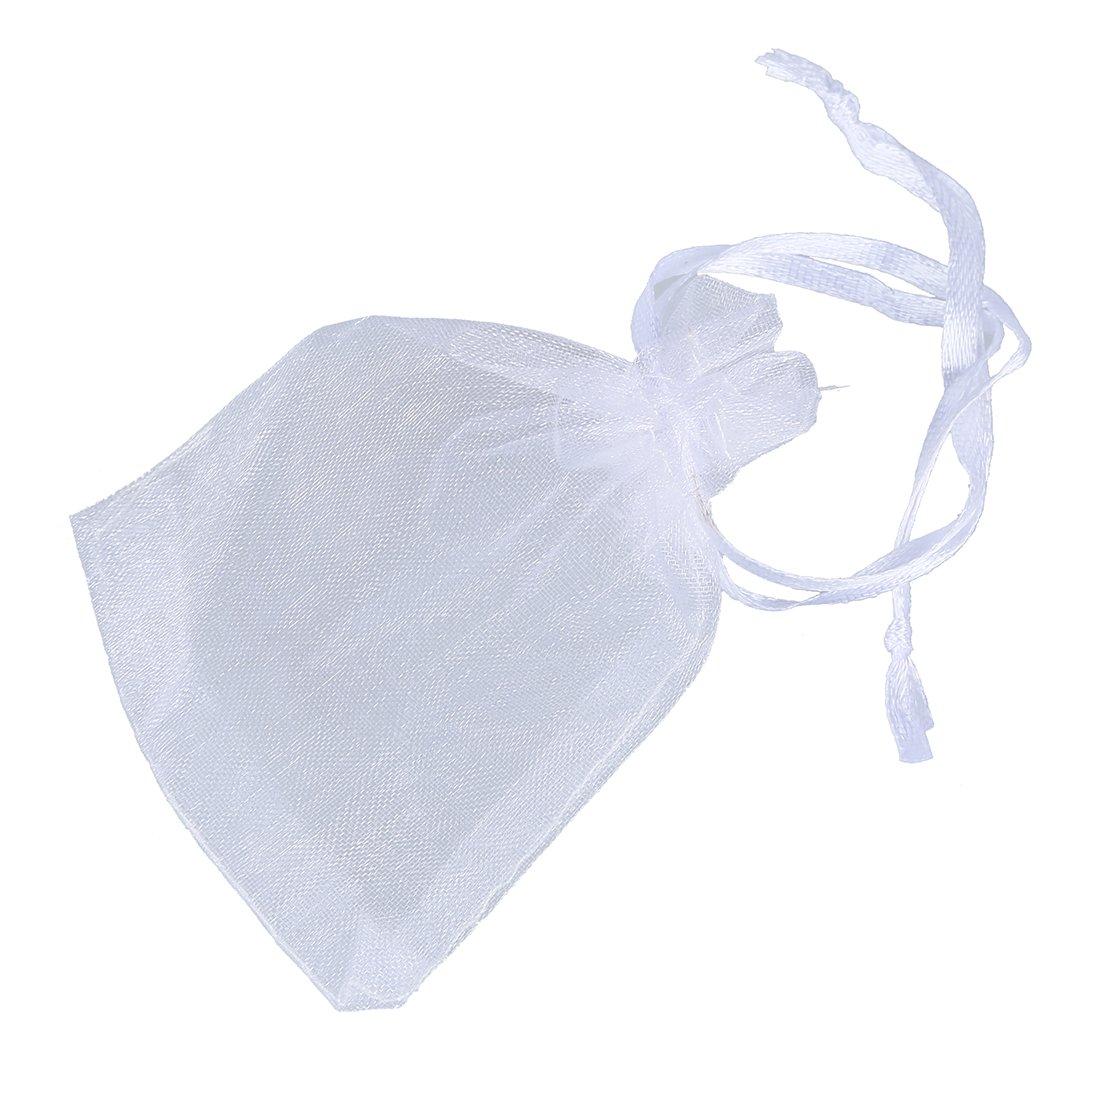 Organza Bag - SODIAL(R) Organza Bag White 7.5 x 10 cm Organza Bag - 50 Pack 010329